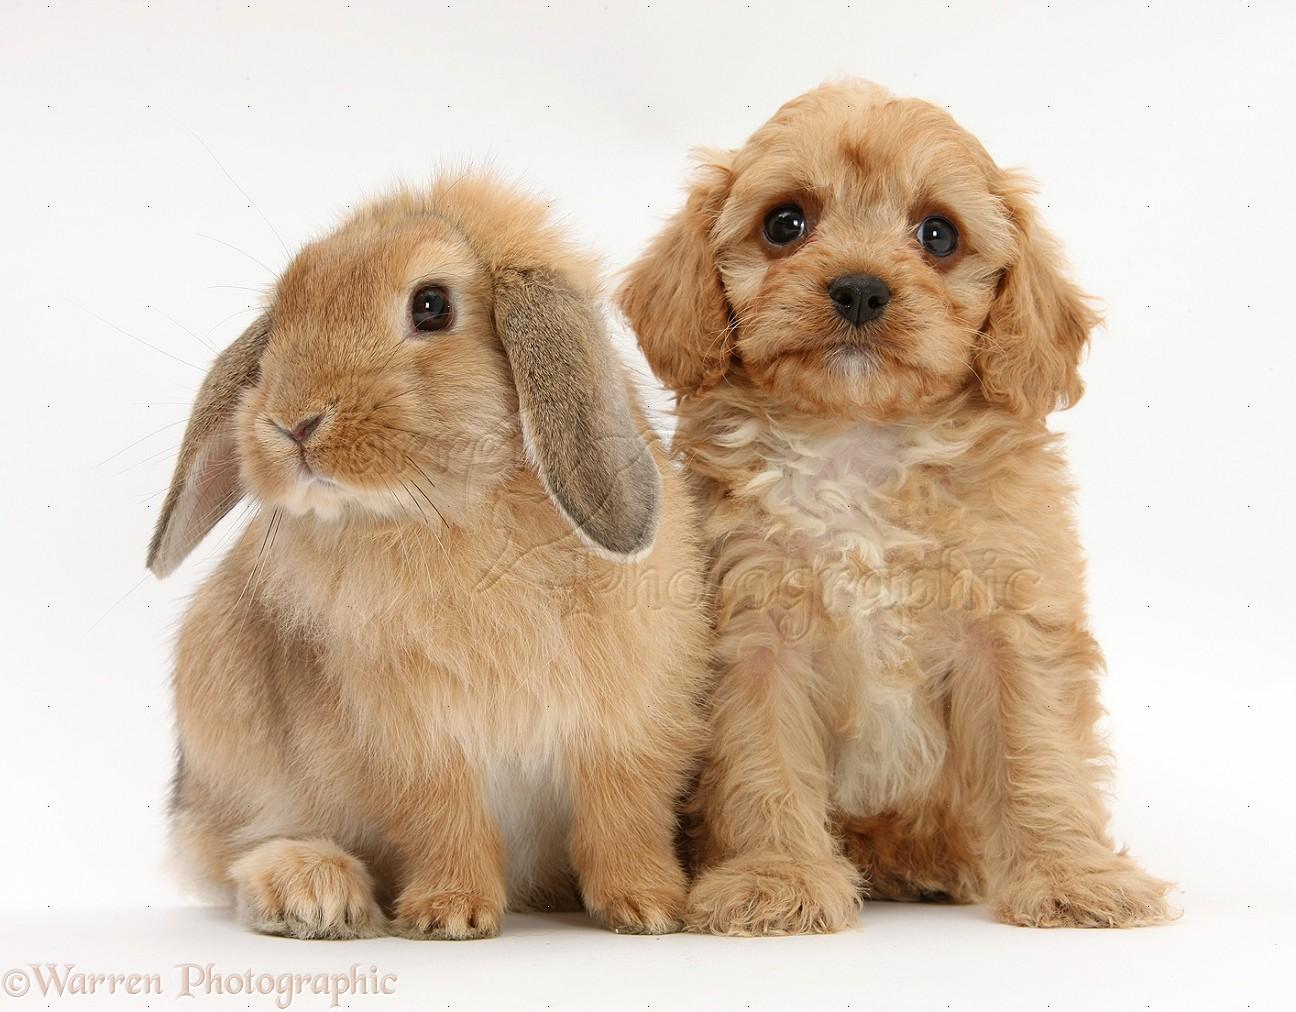 Pets cavapoo pup and sandy lop rabbit photo wp31831